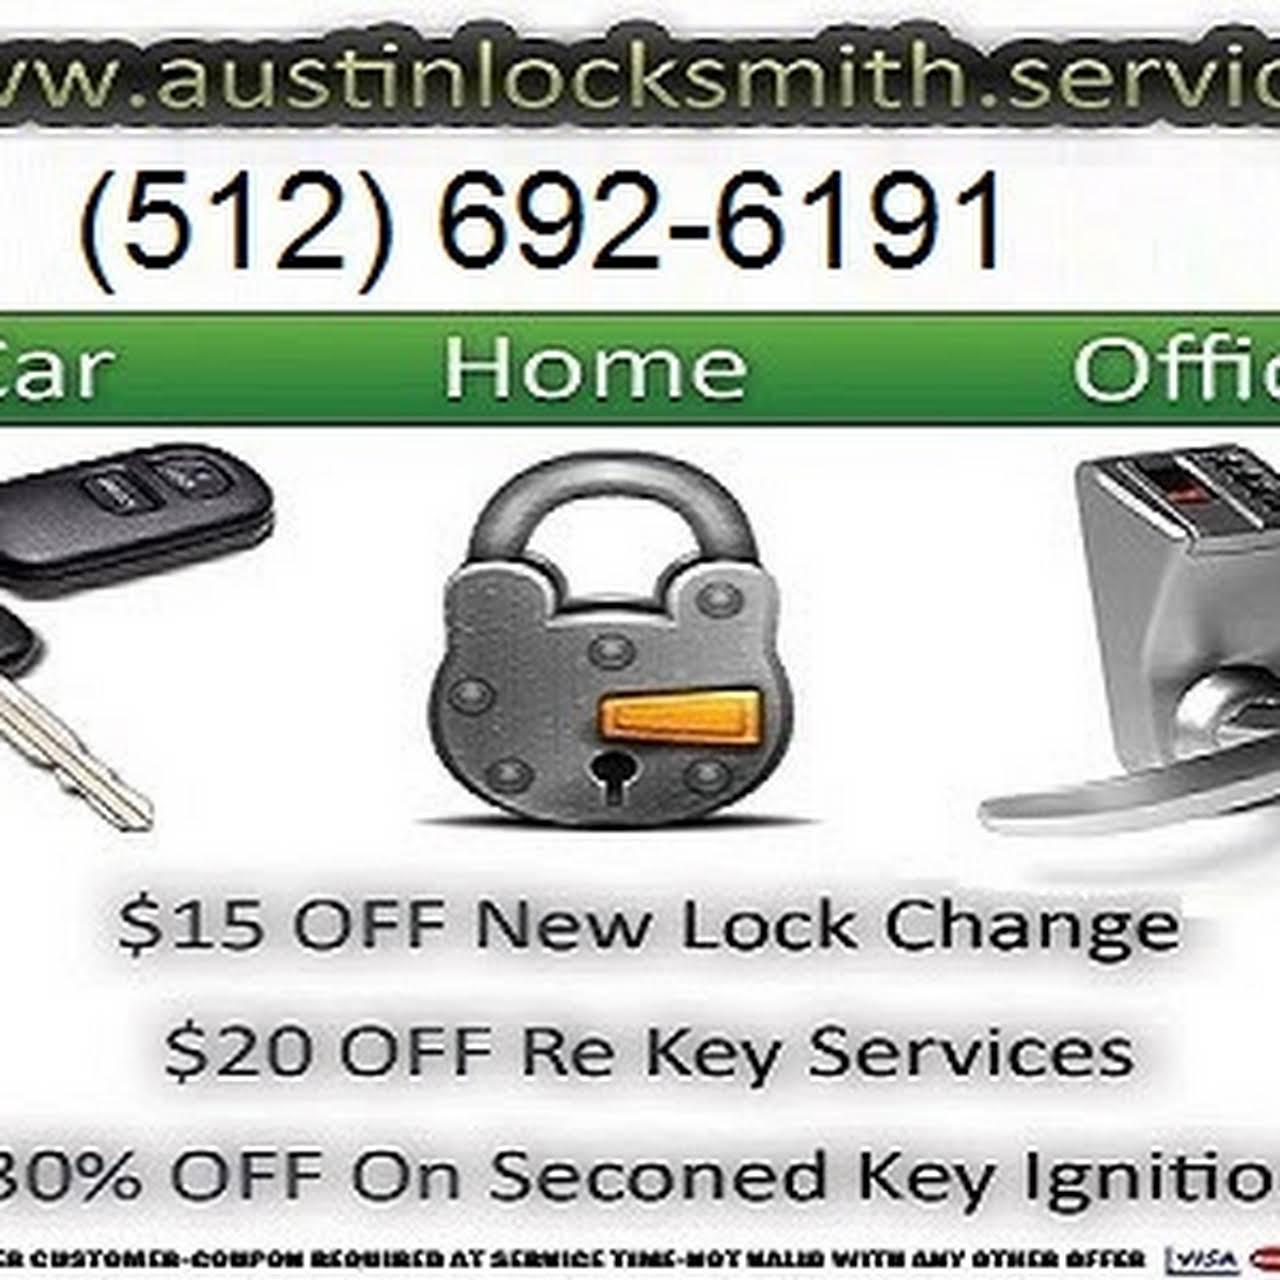 Key Fob Programming Near Me >> Key Fob Programming Near Me Locksmith 15 Off